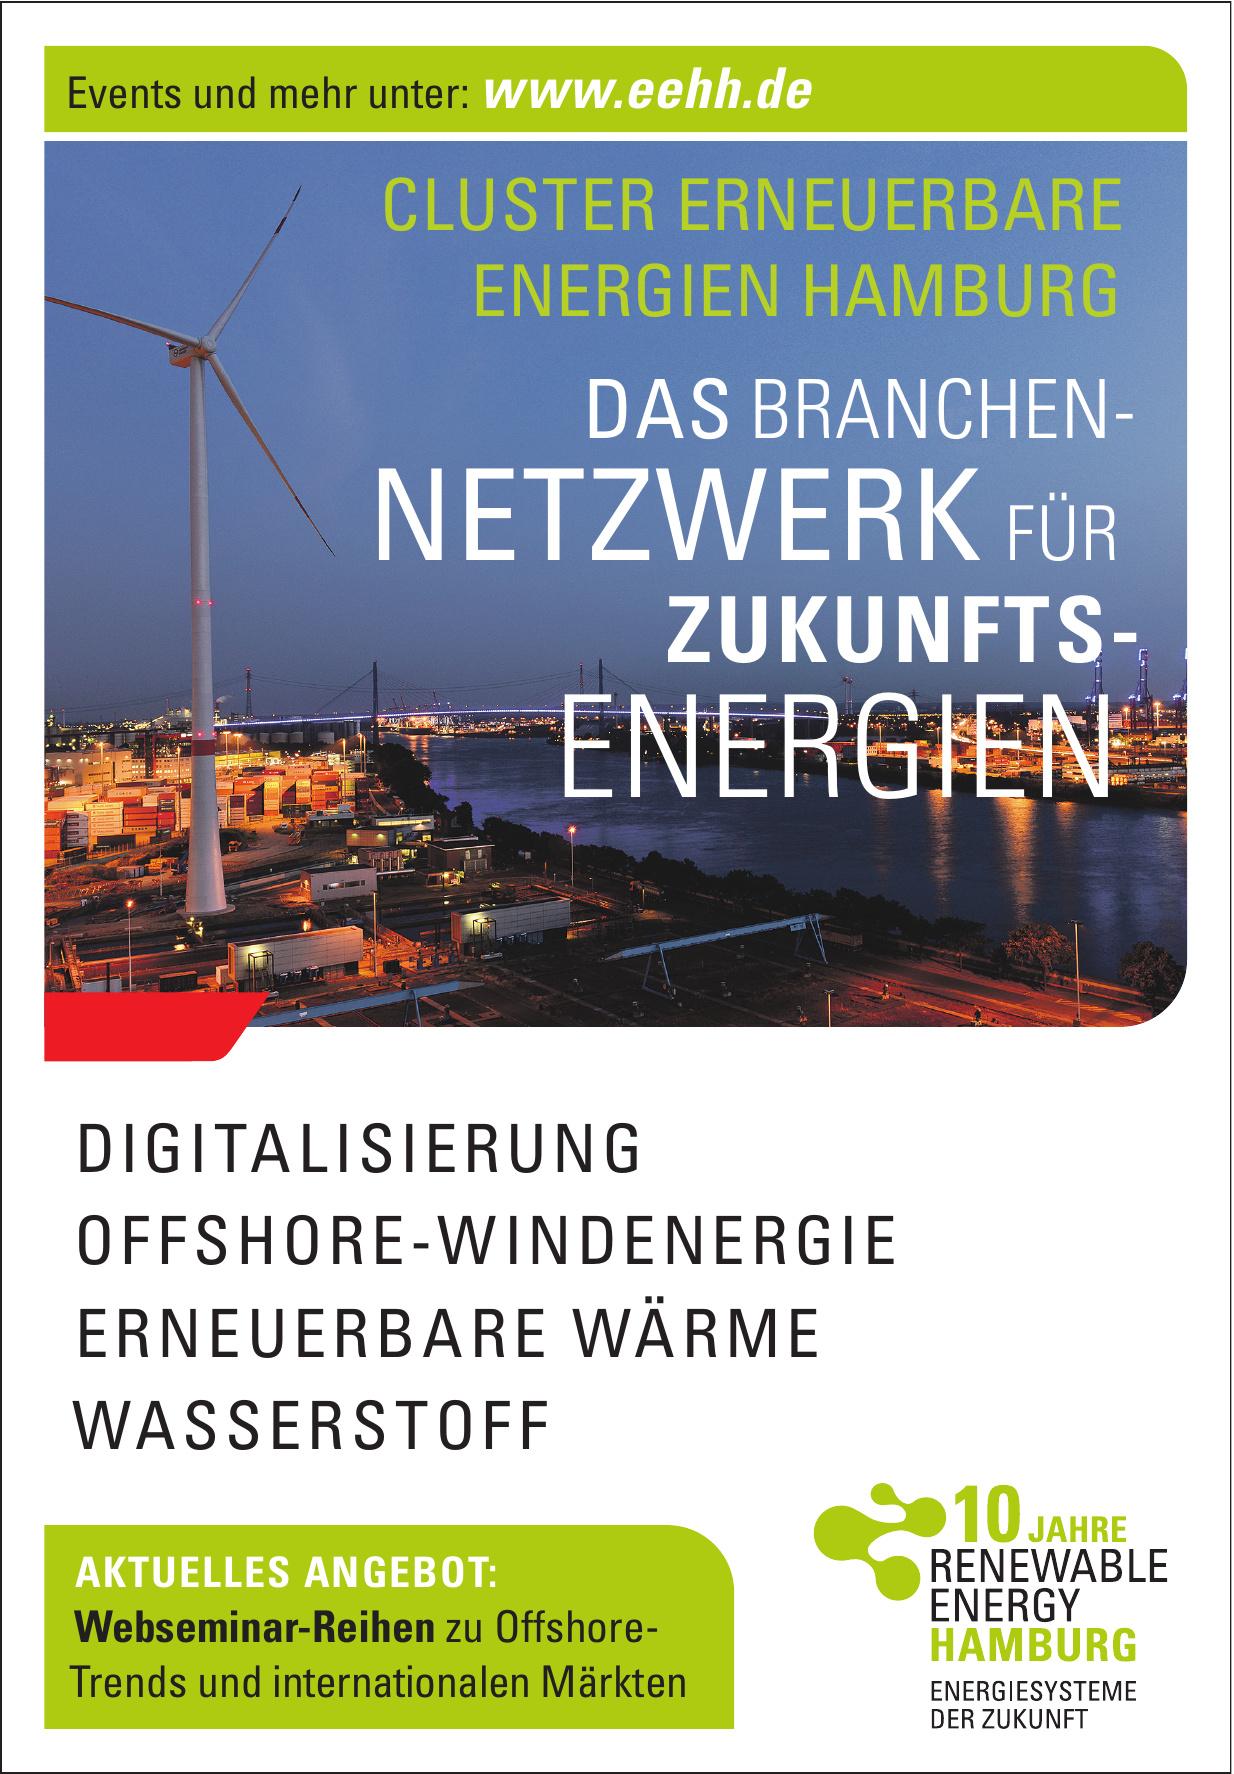 Renewable Energy Hamburg - Energiesysteme der Zukunft